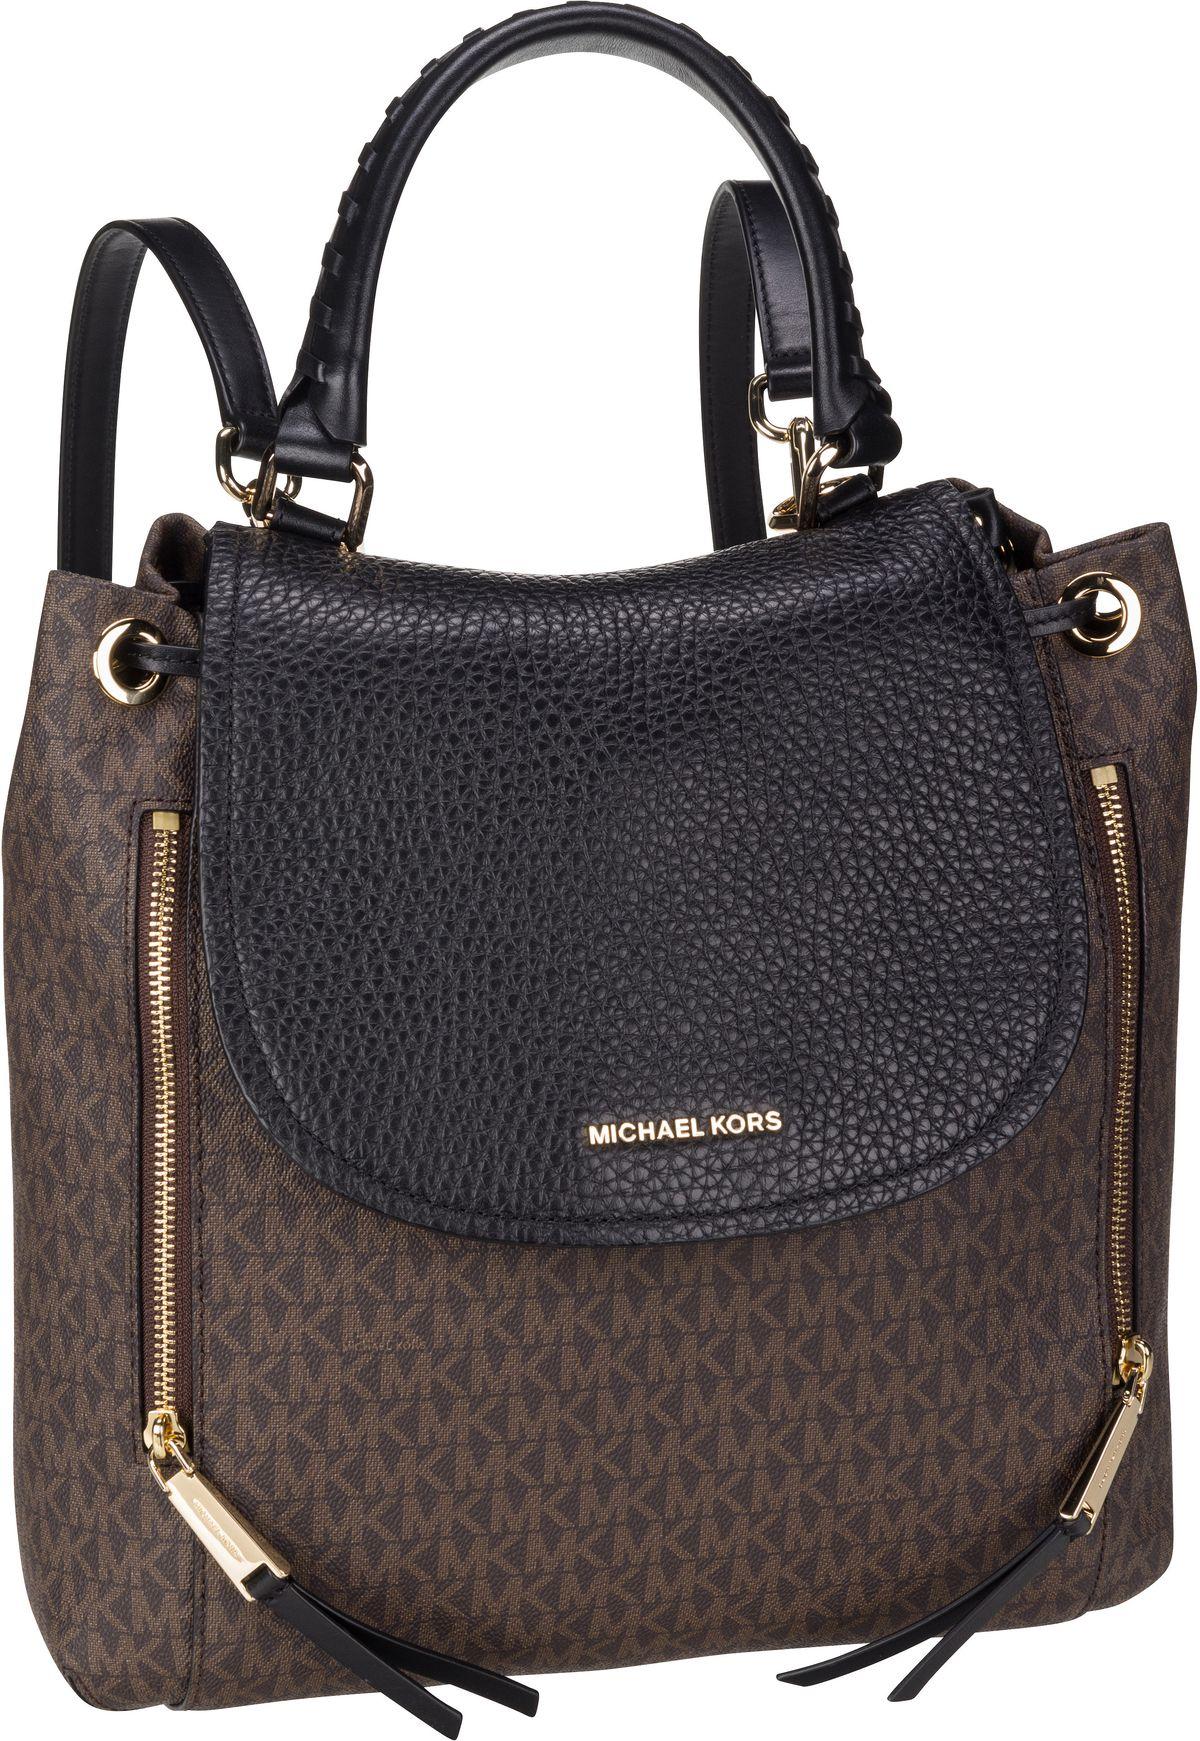 Rucksack / Daypack Viv Large Backpack MK Signature Brown/Black